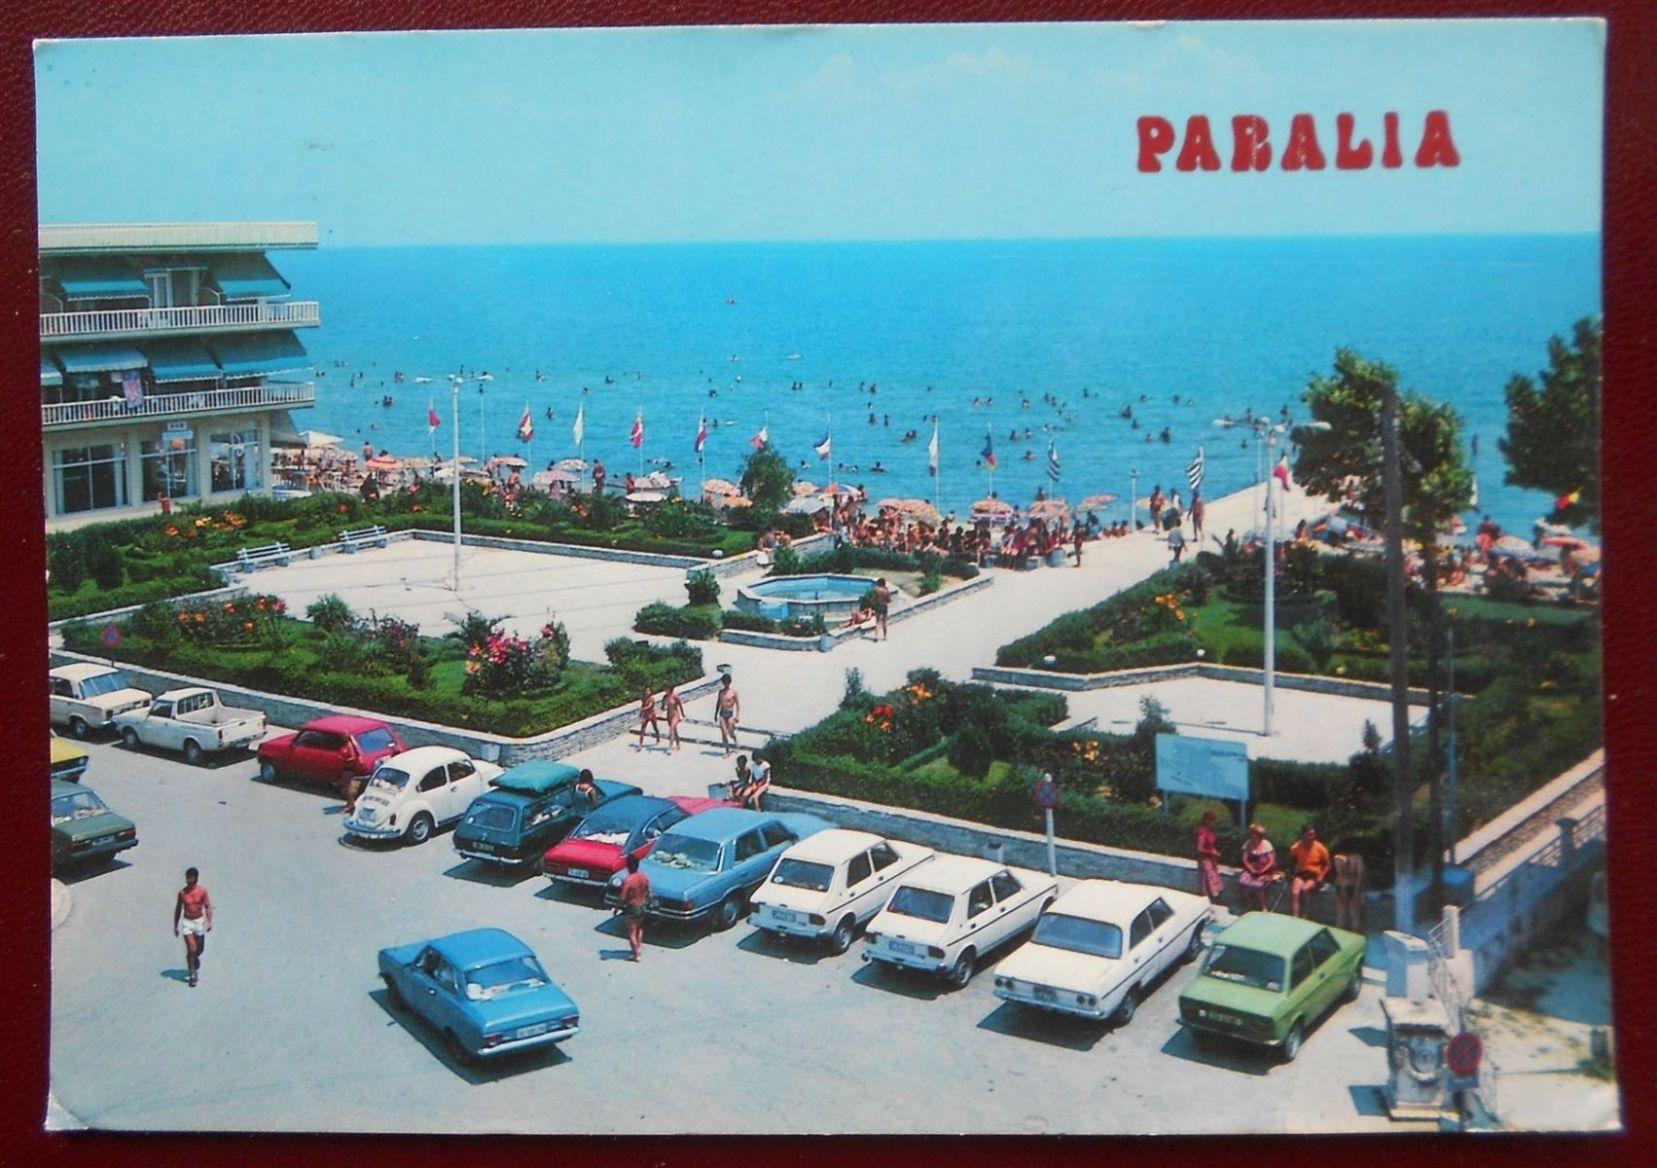 Paralia_slika_O_84158073.jpg